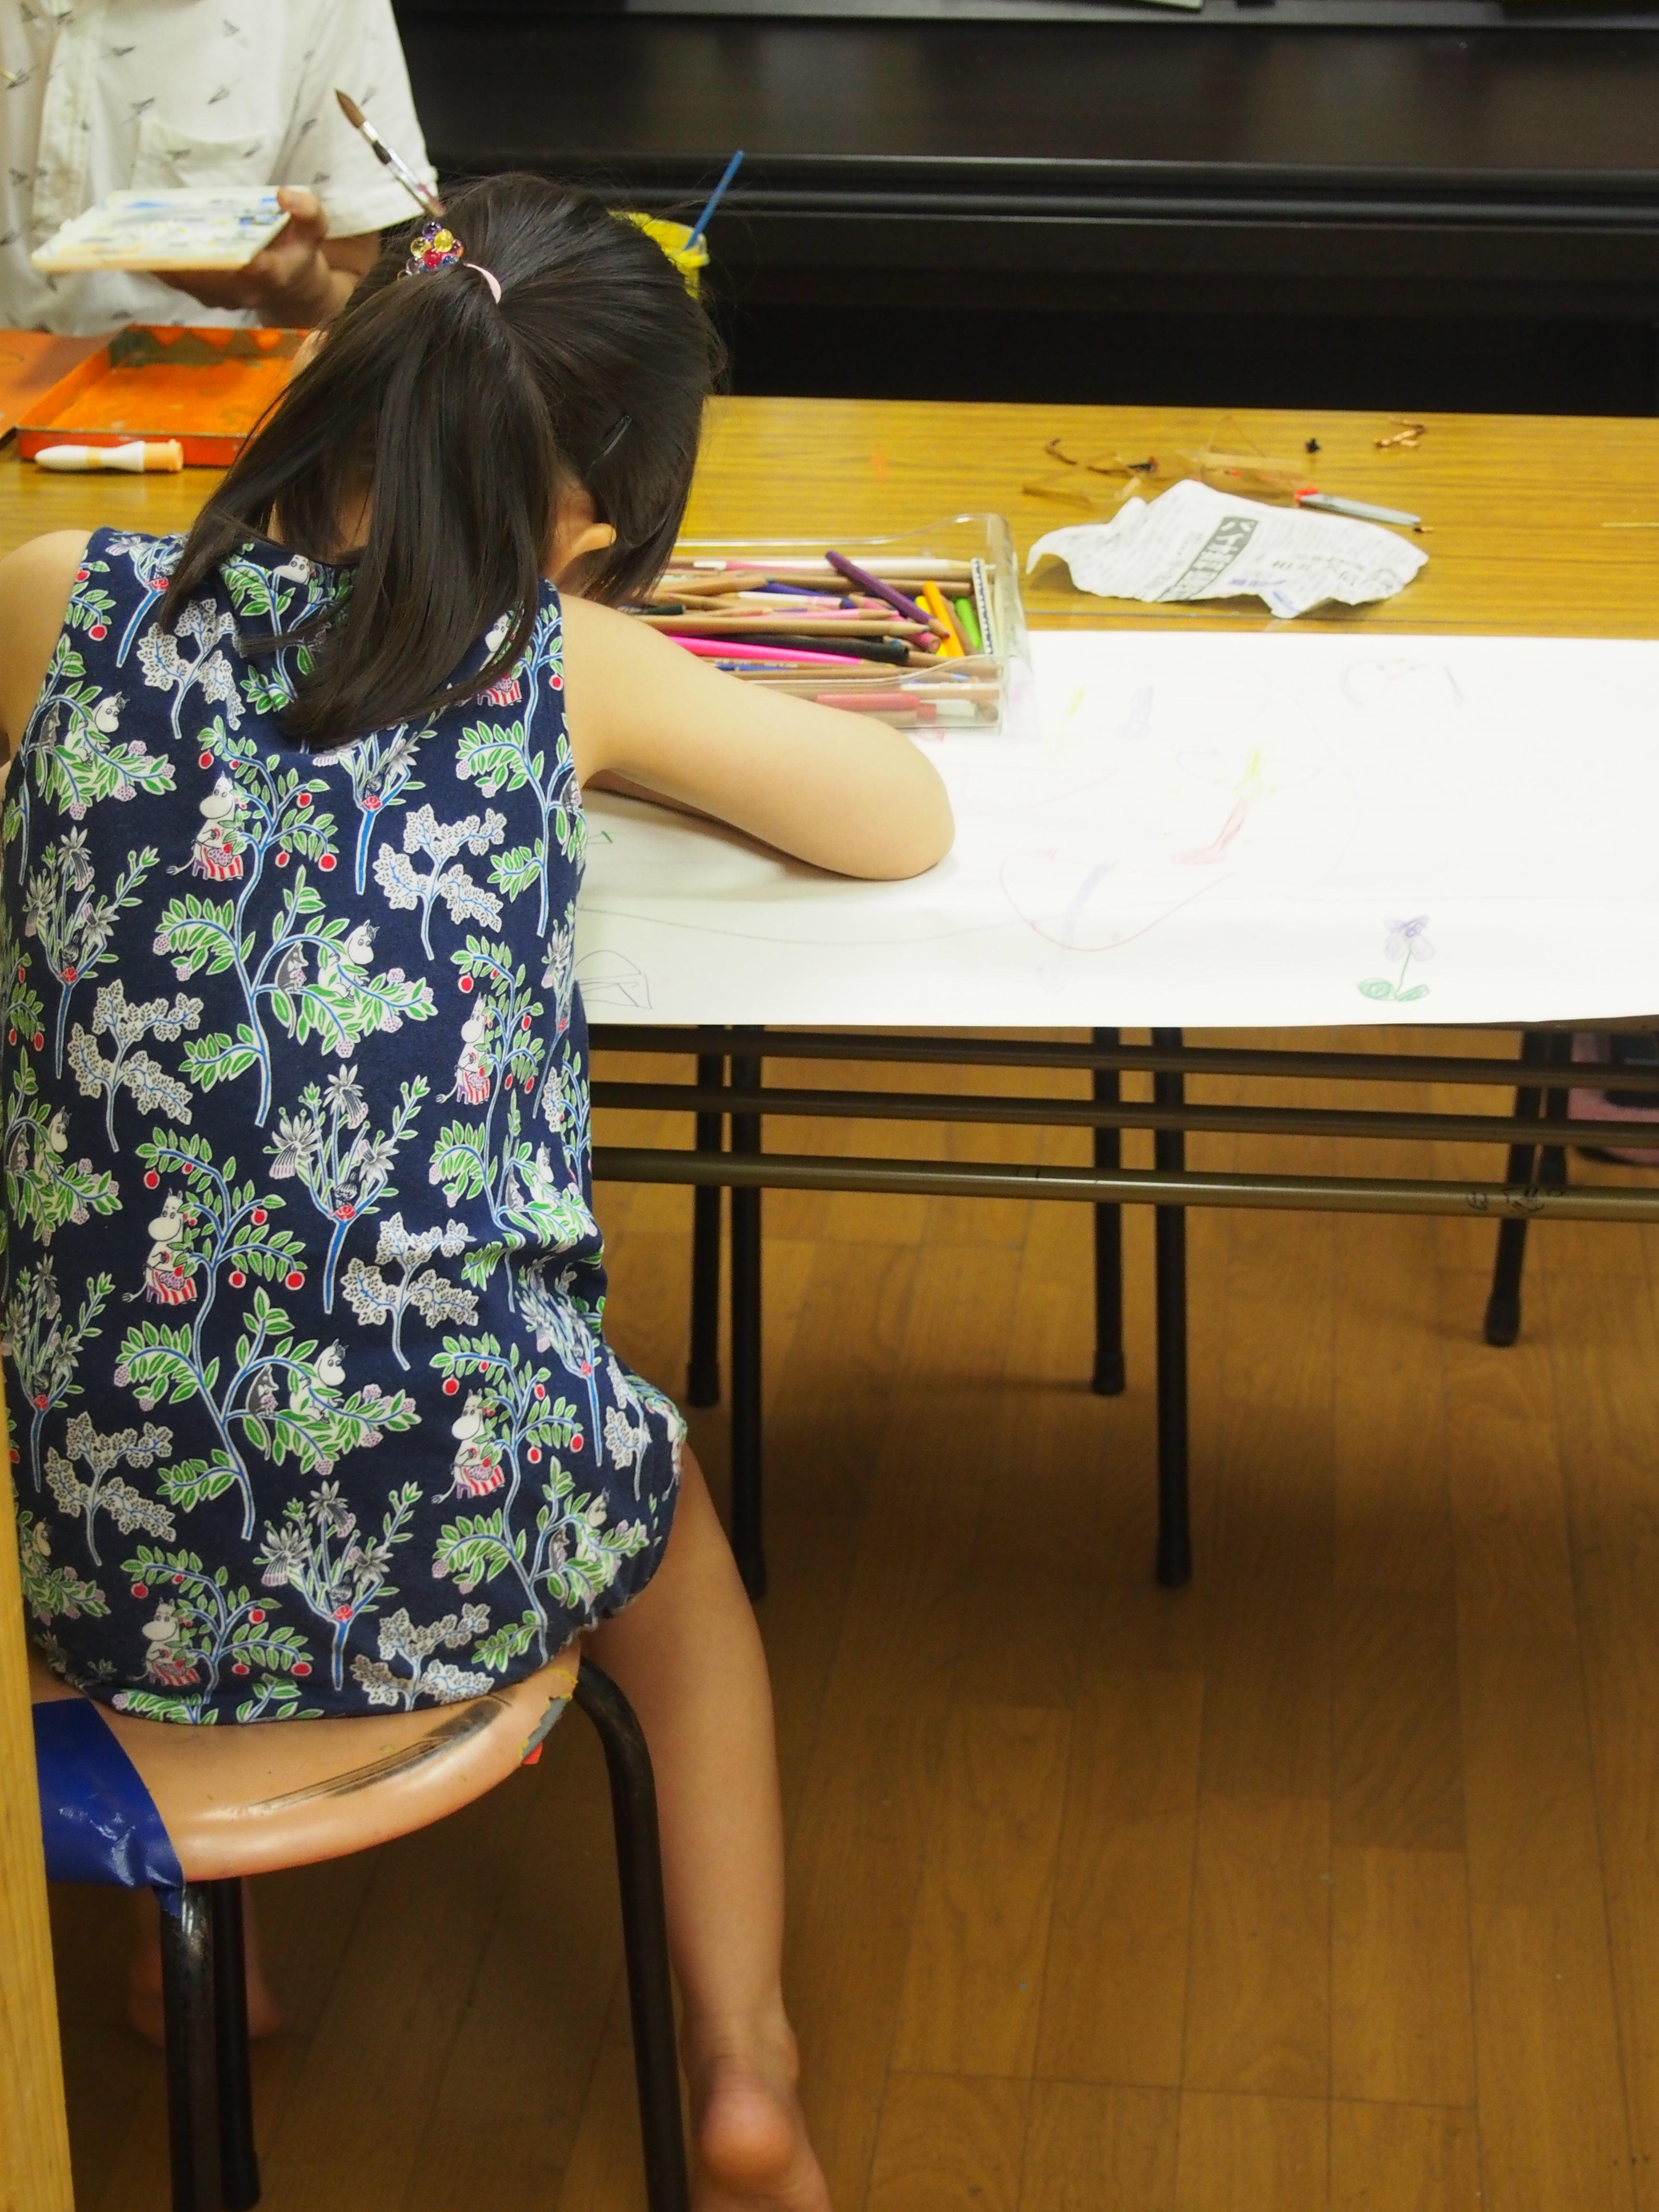 【JS】女子小学生 高学年画像スレPart27【JS】 [転載禁止]©bbspink.comYouTube動画>9本 ->画像>374枚